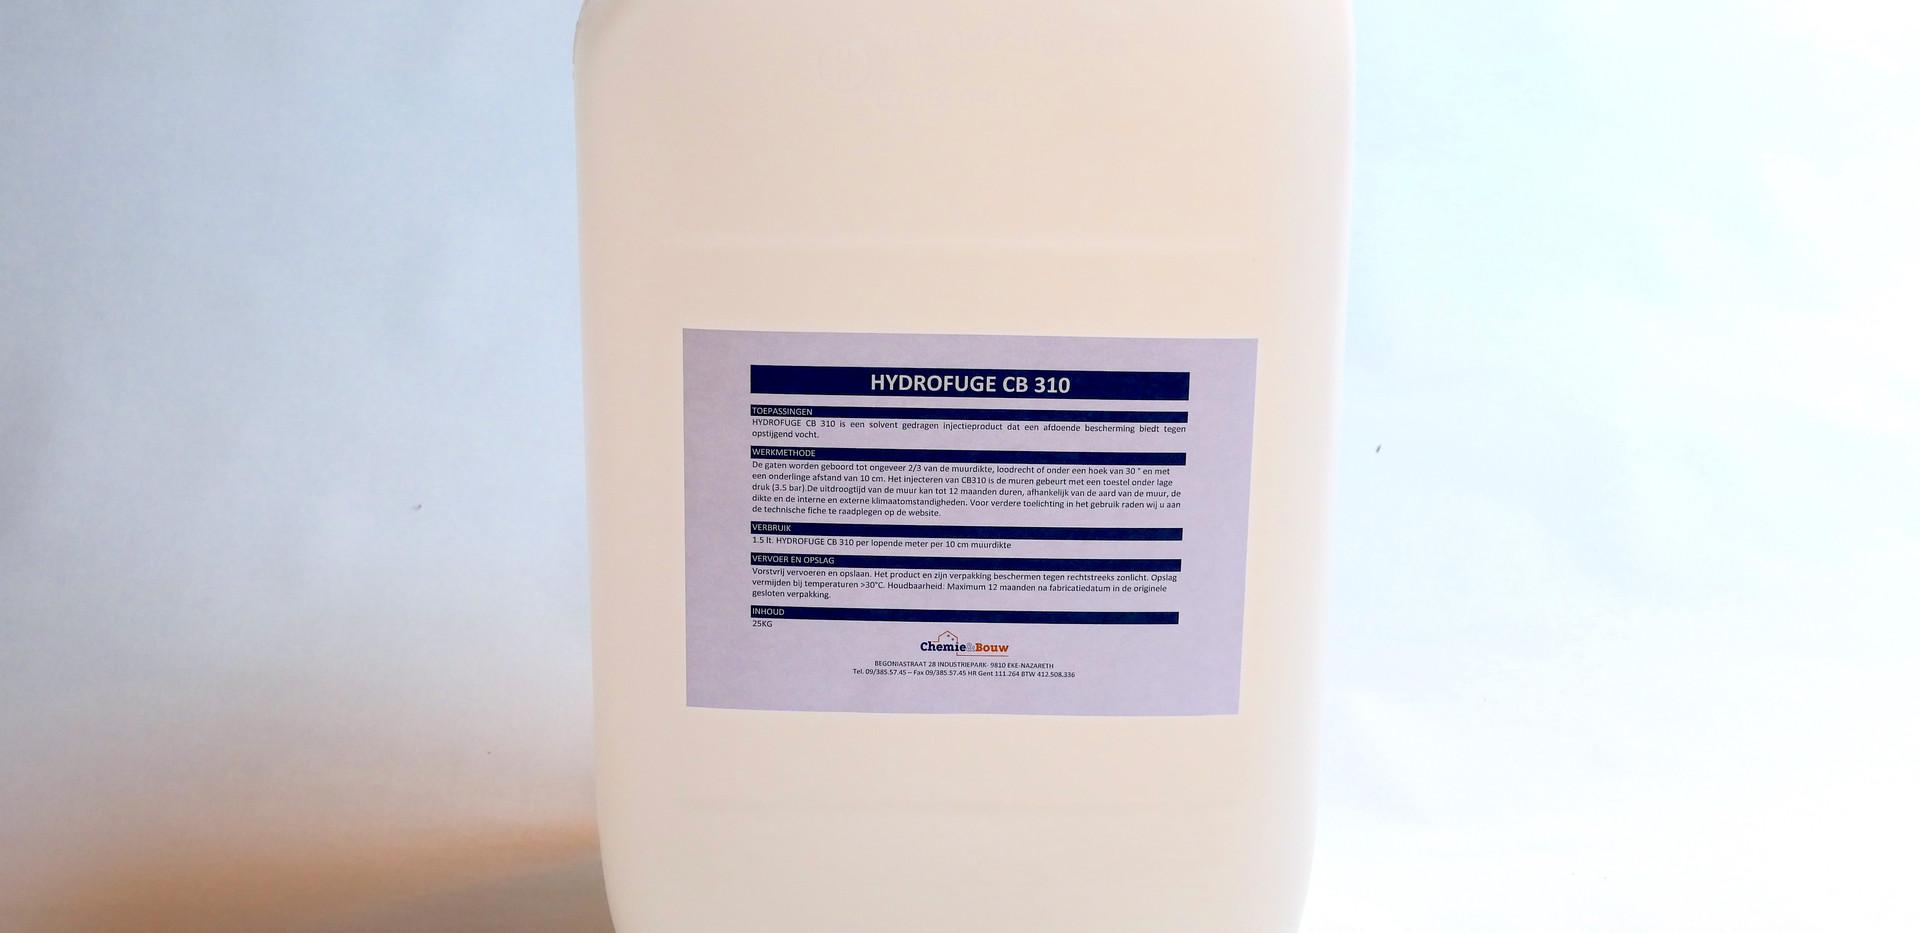 Hydrofuge CB310.JPG